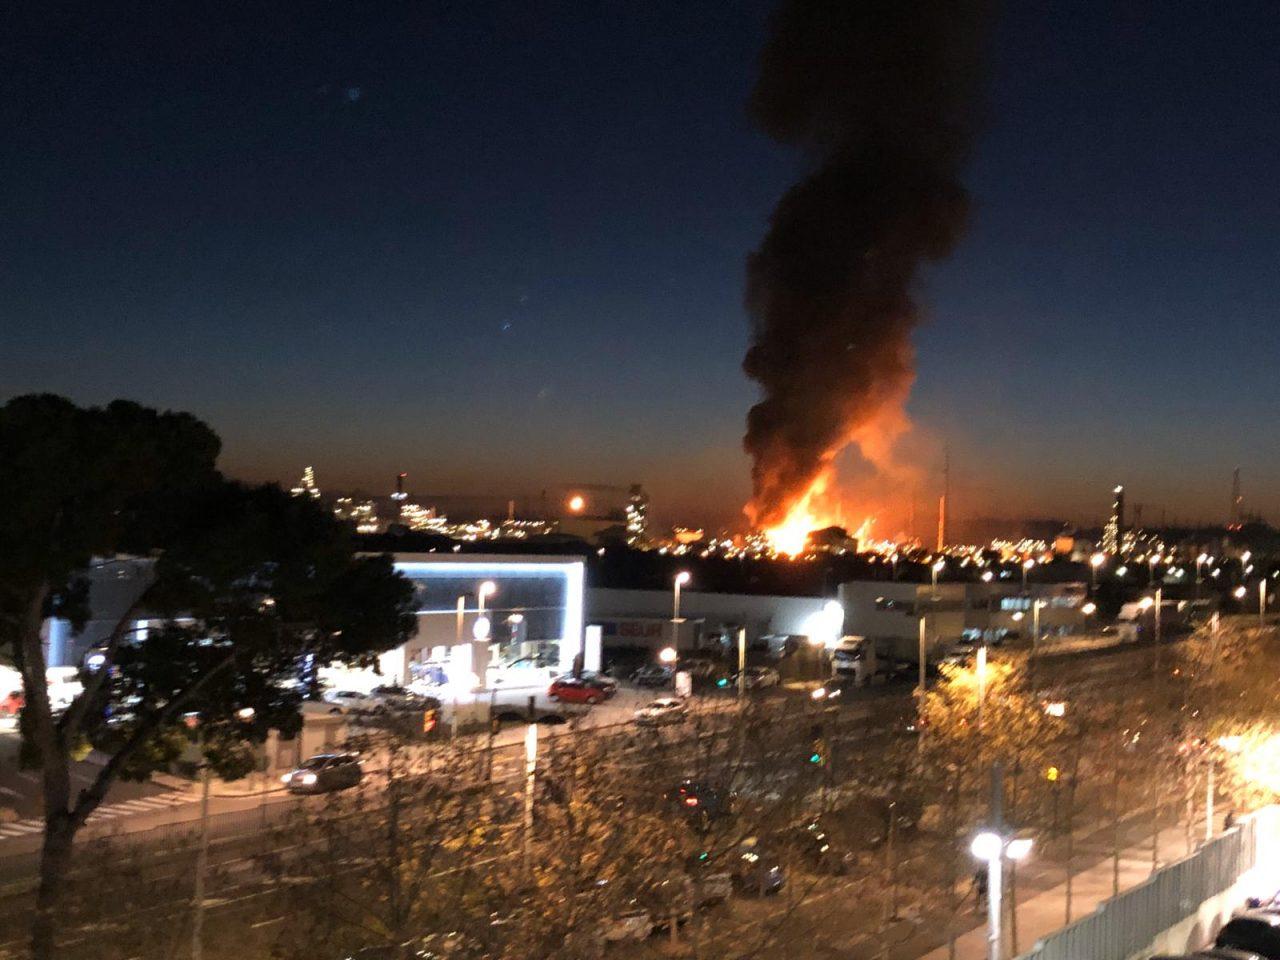 incendi5-1280x960.jpg